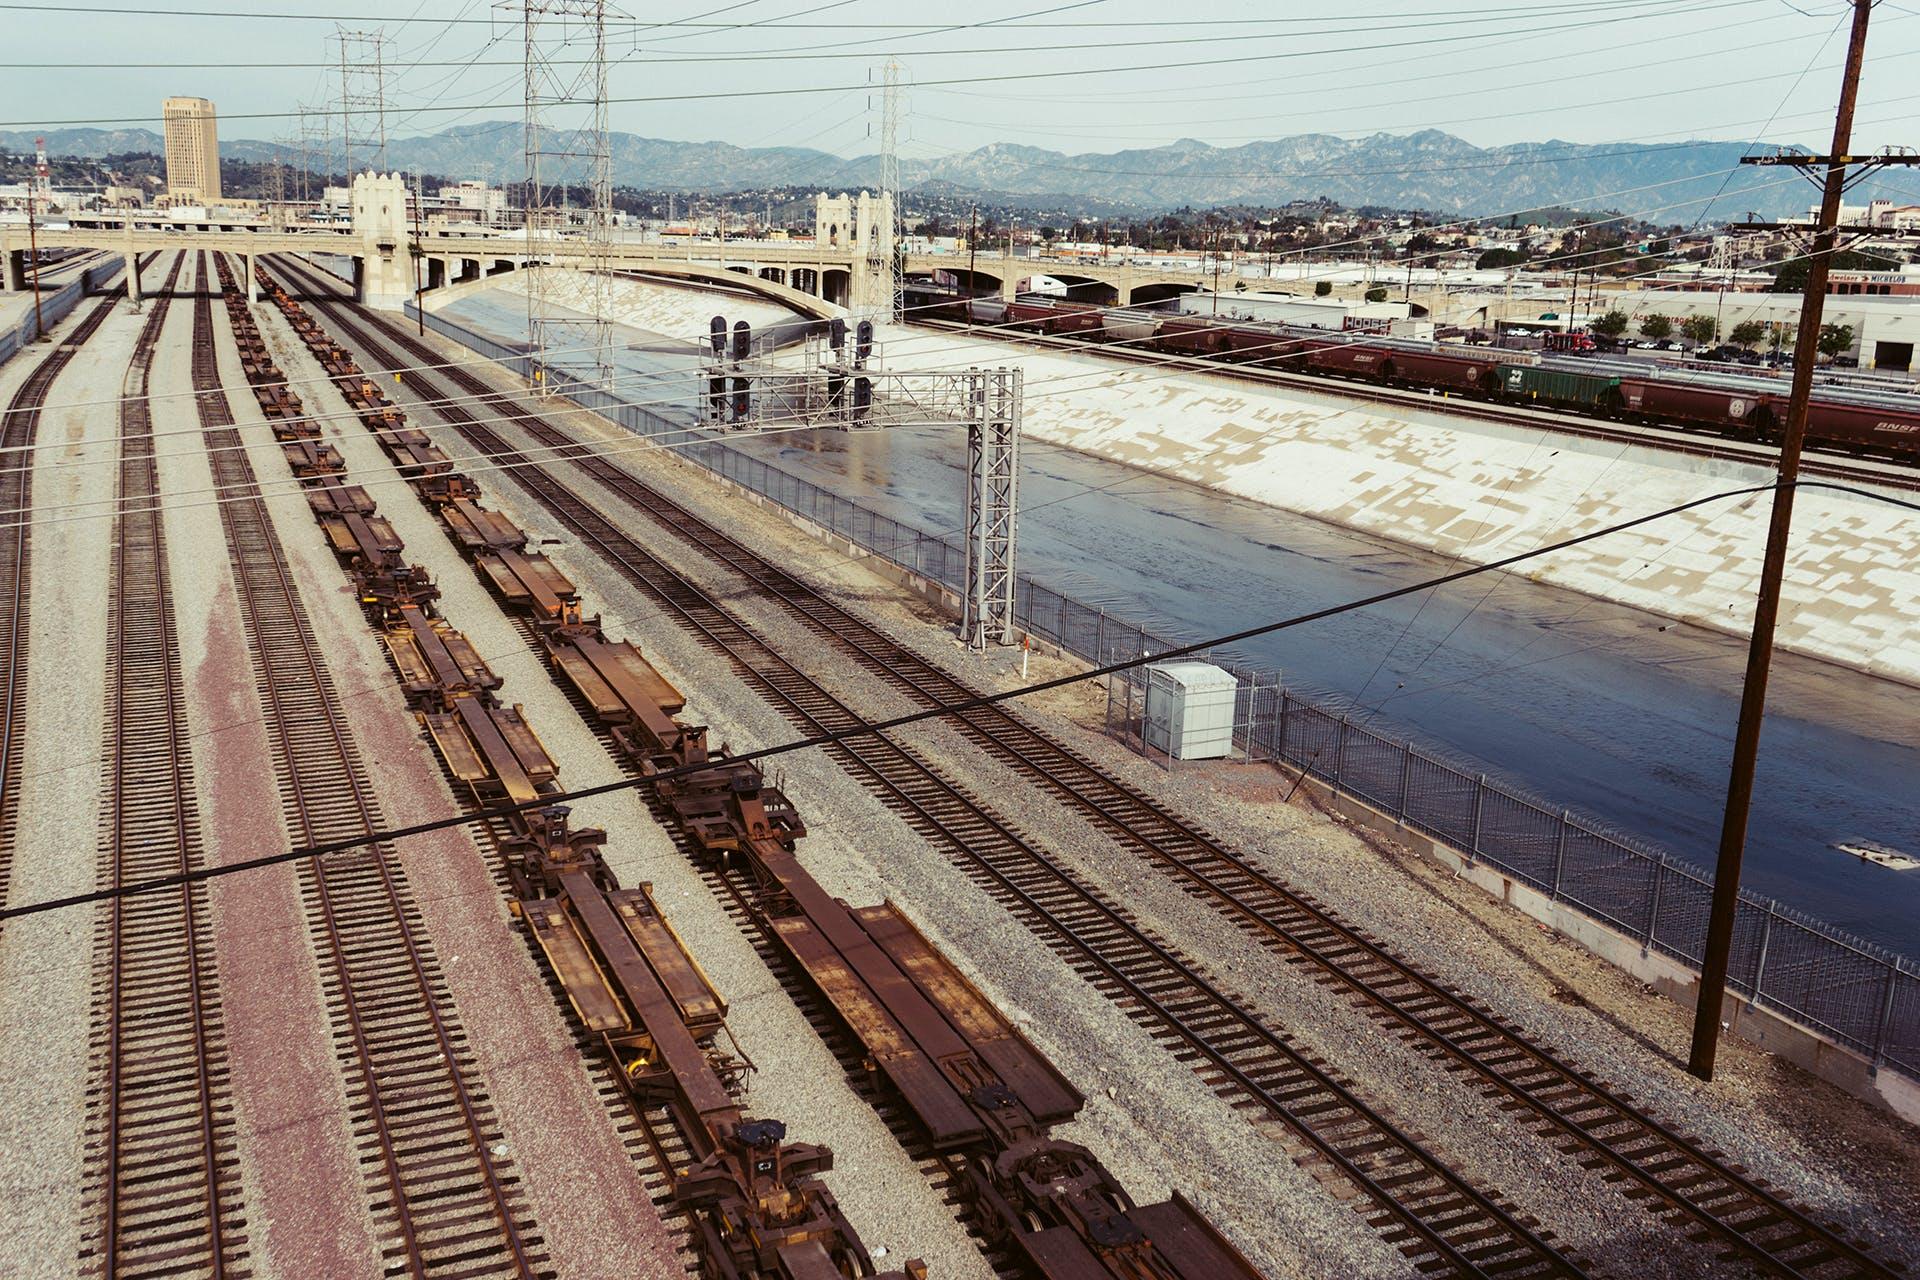 industry, rails, train